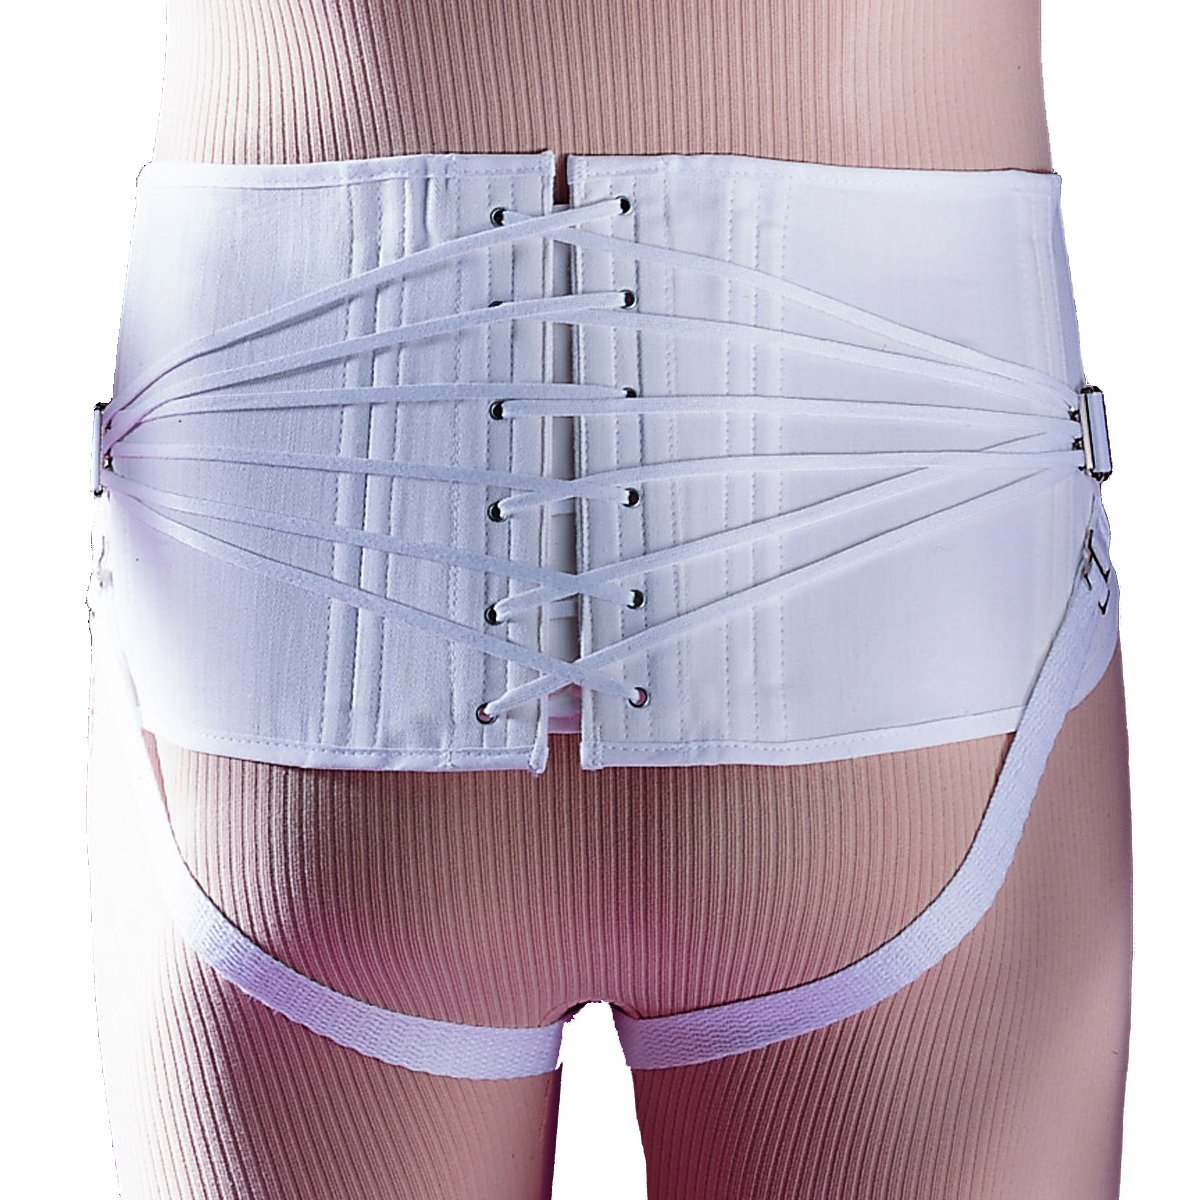 Men's Back-Lace Sacroiliac Max 86% OFF w Popular popular Back Corset Pad 308 Support Brace